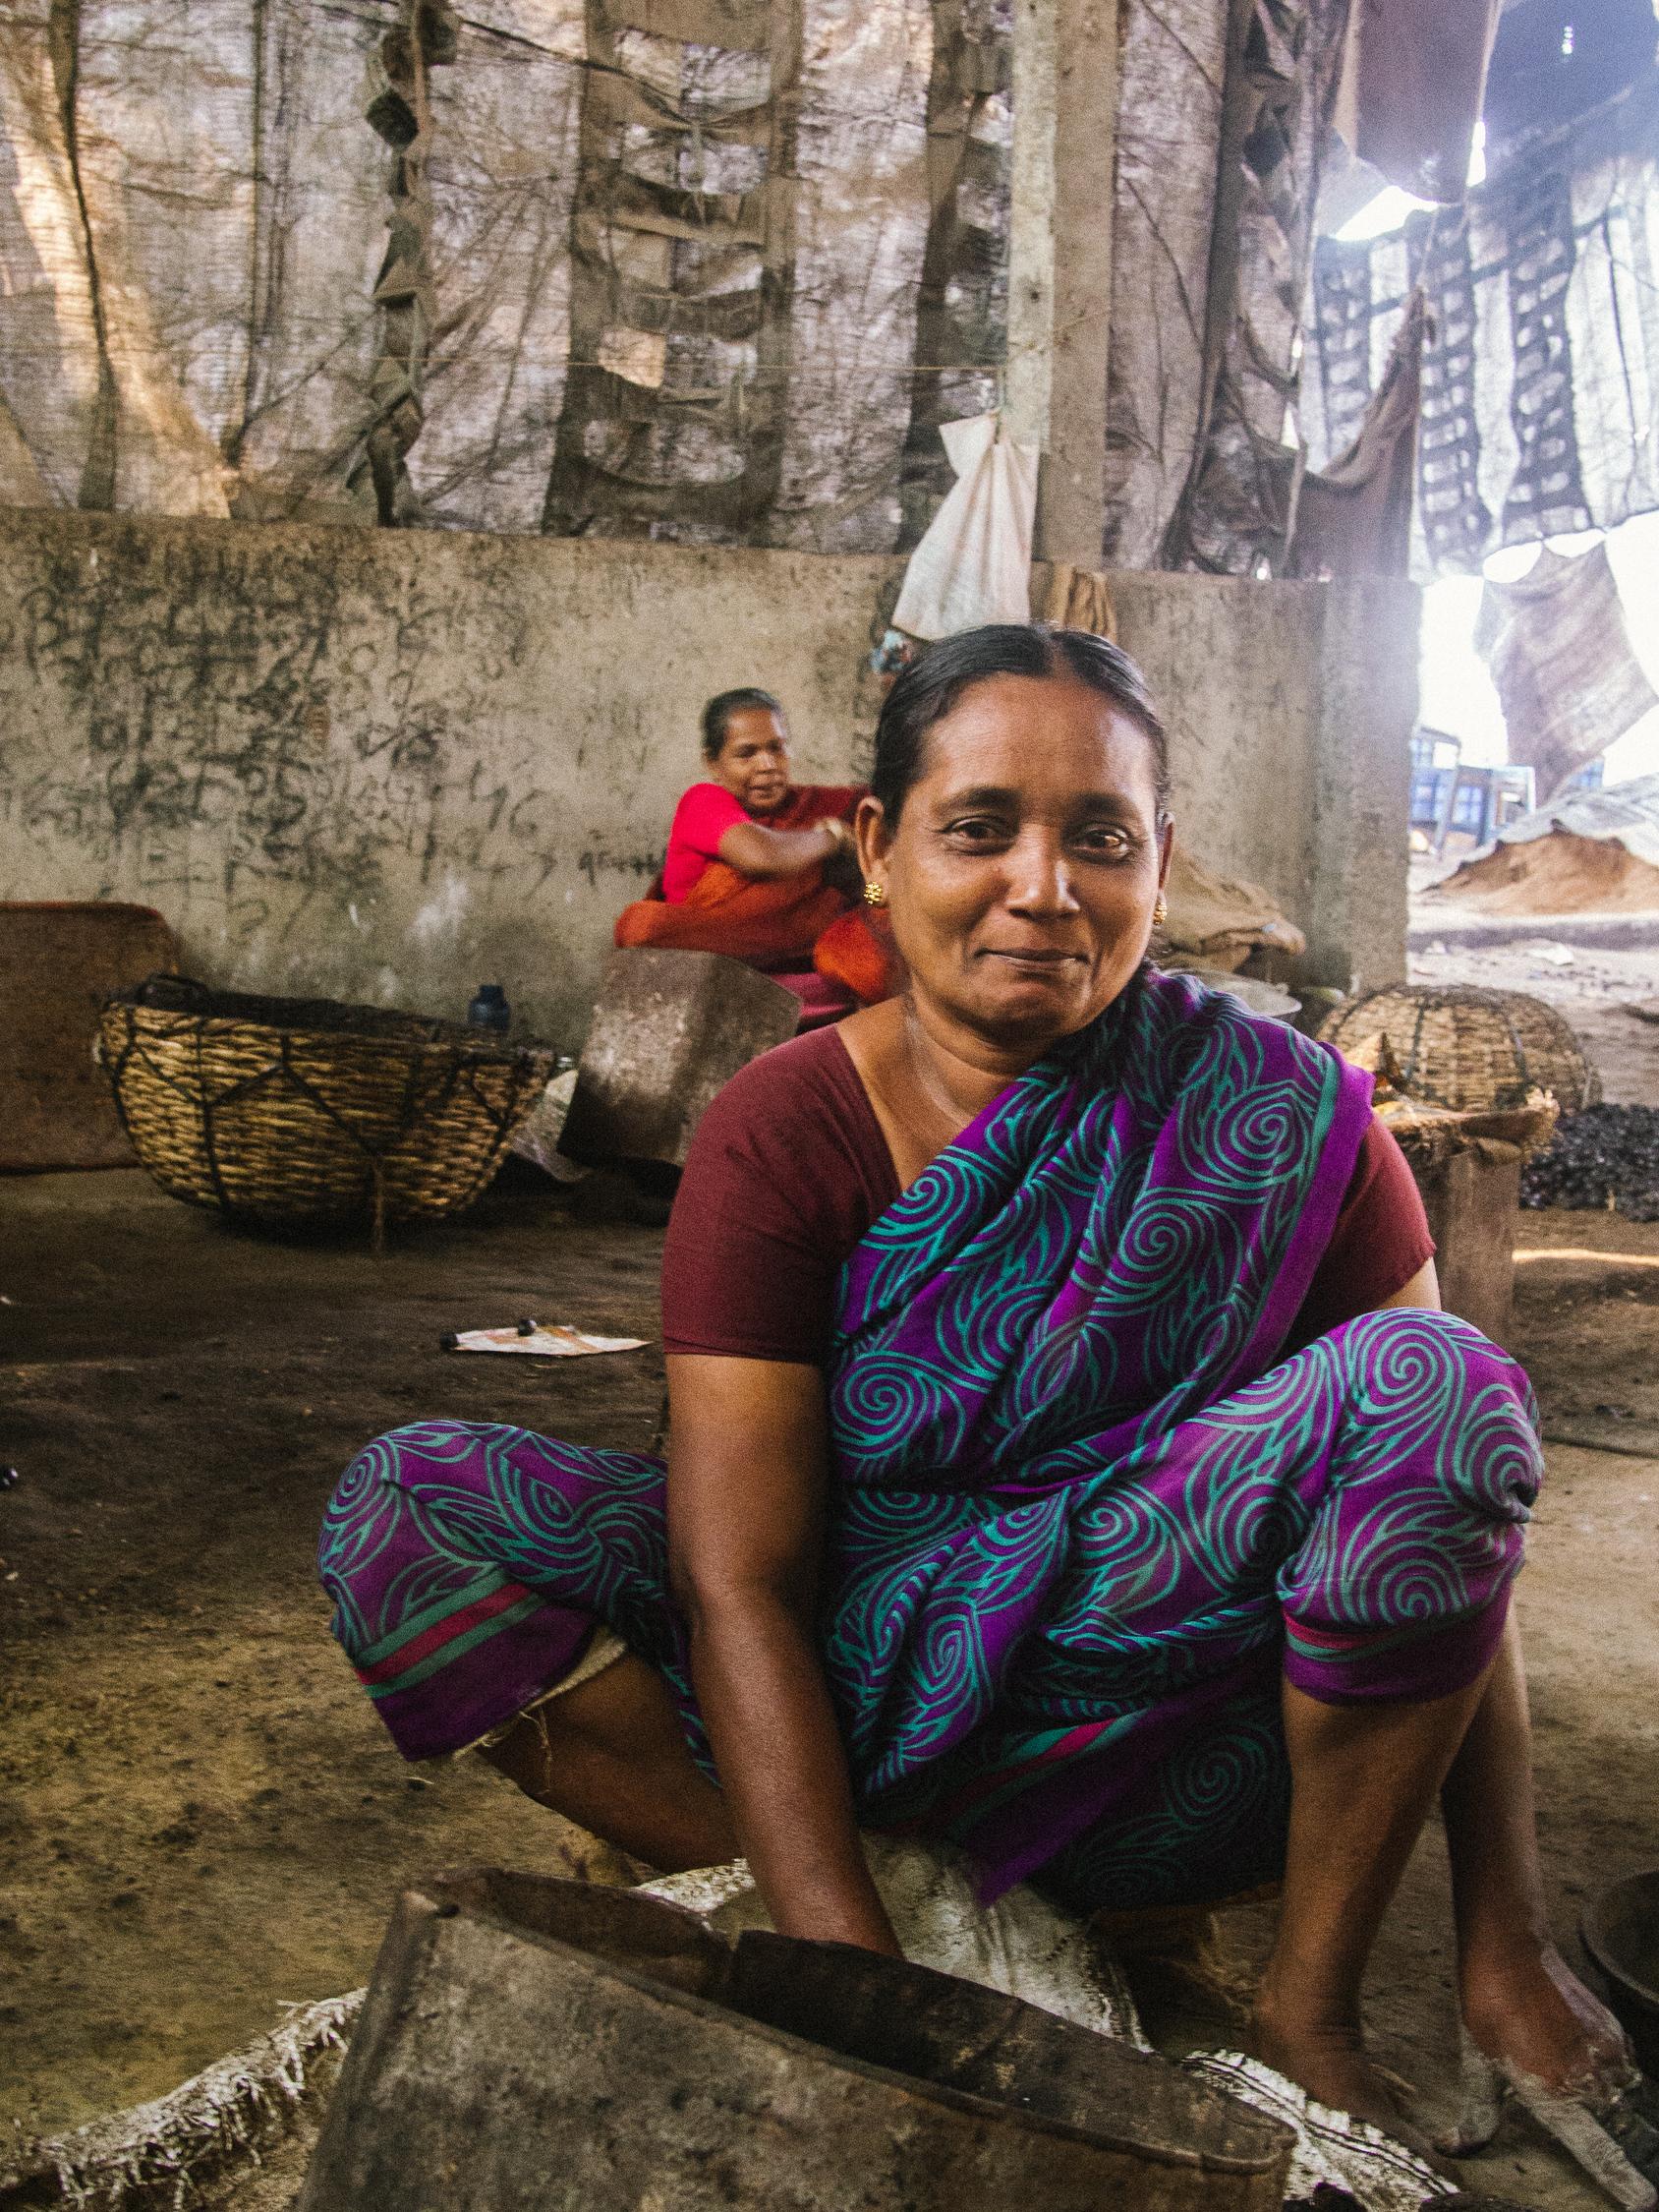 Woman smiling at camera in Kerala cashew factory